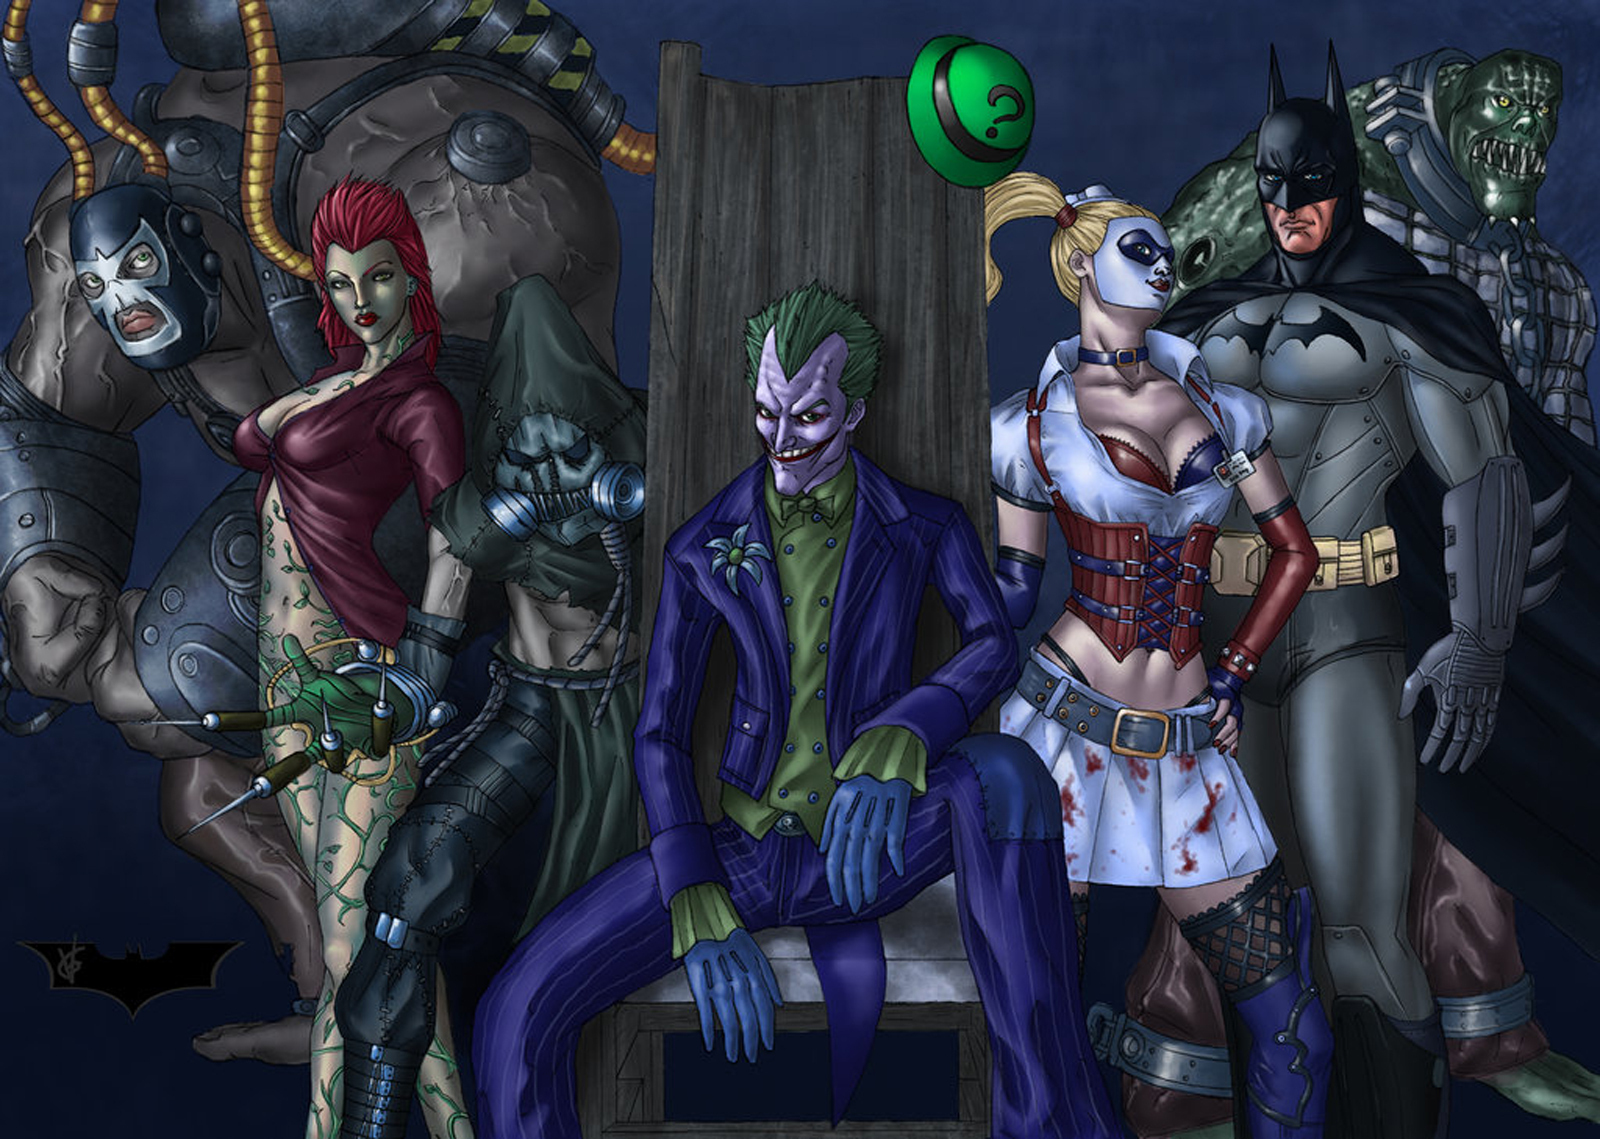 ivy batman arkham asylum wallpaper 1600x1139 35166 WallpaperUP 1600x1139